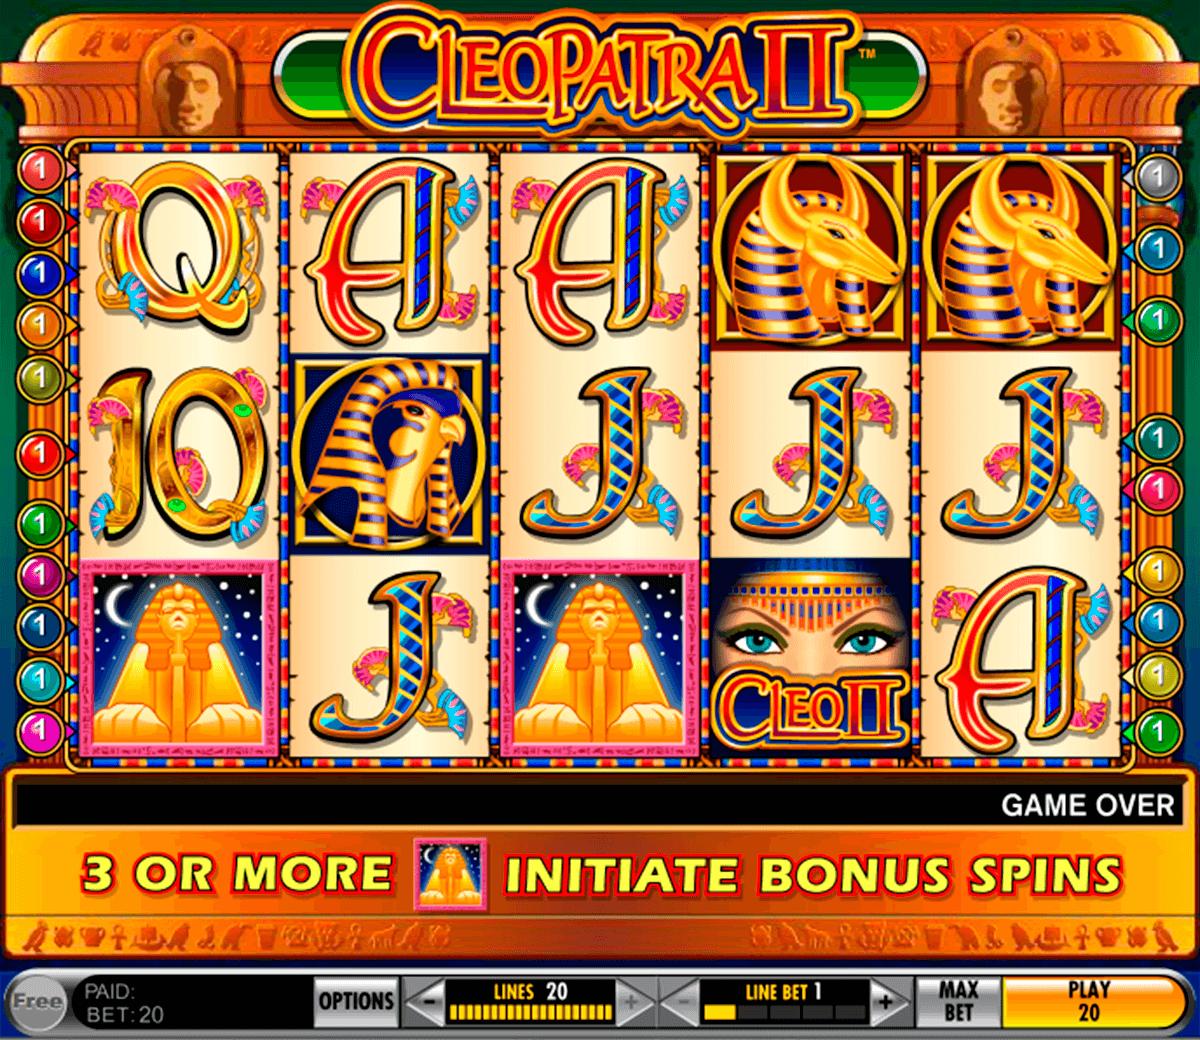 Bono sin deposito poker tragamonedas por dinero real Almada 372100